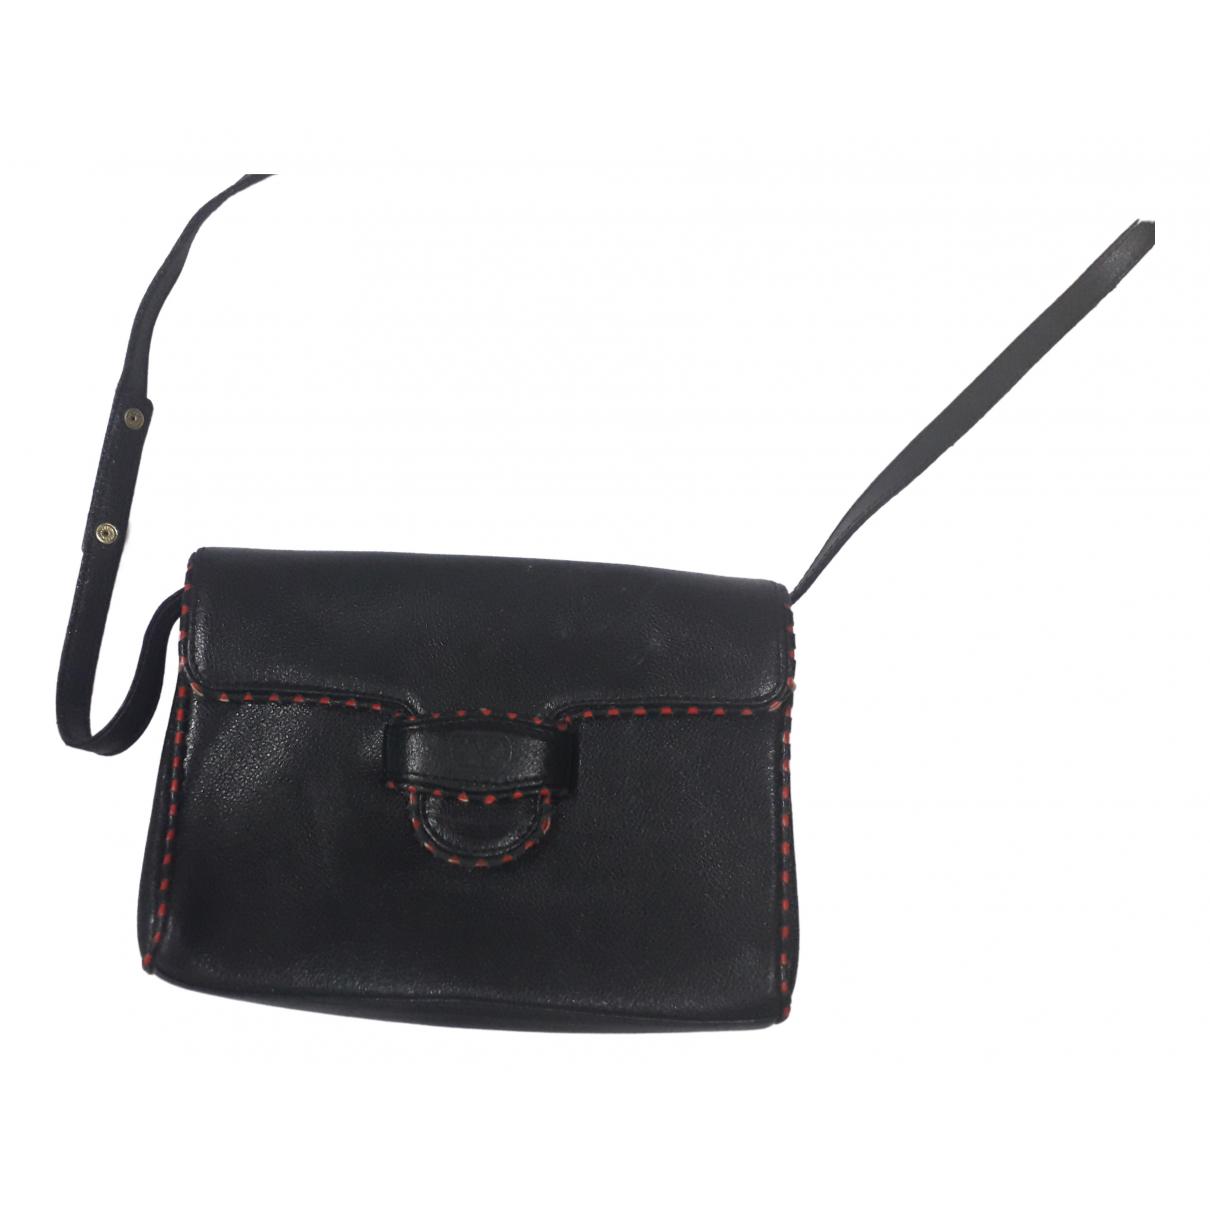 Valentino Garavani \N Black Leather handbag for Women \N